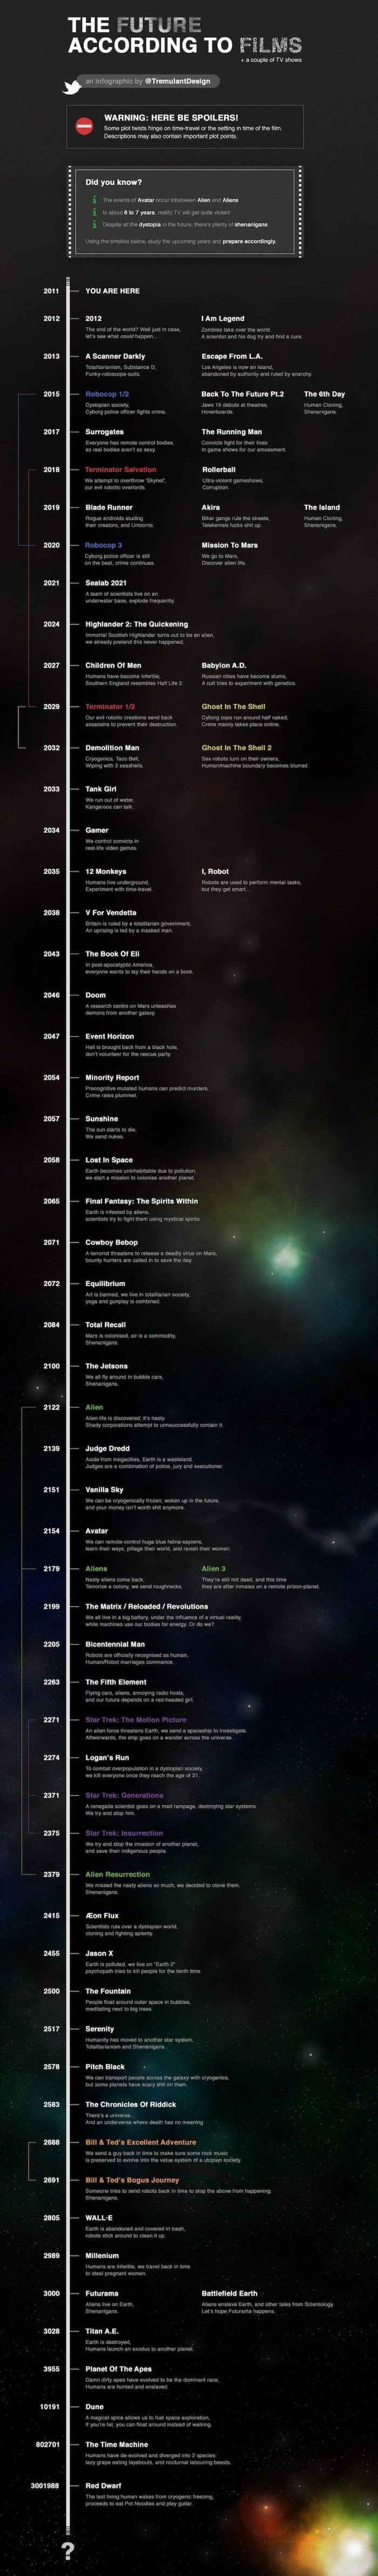 Future According to Films